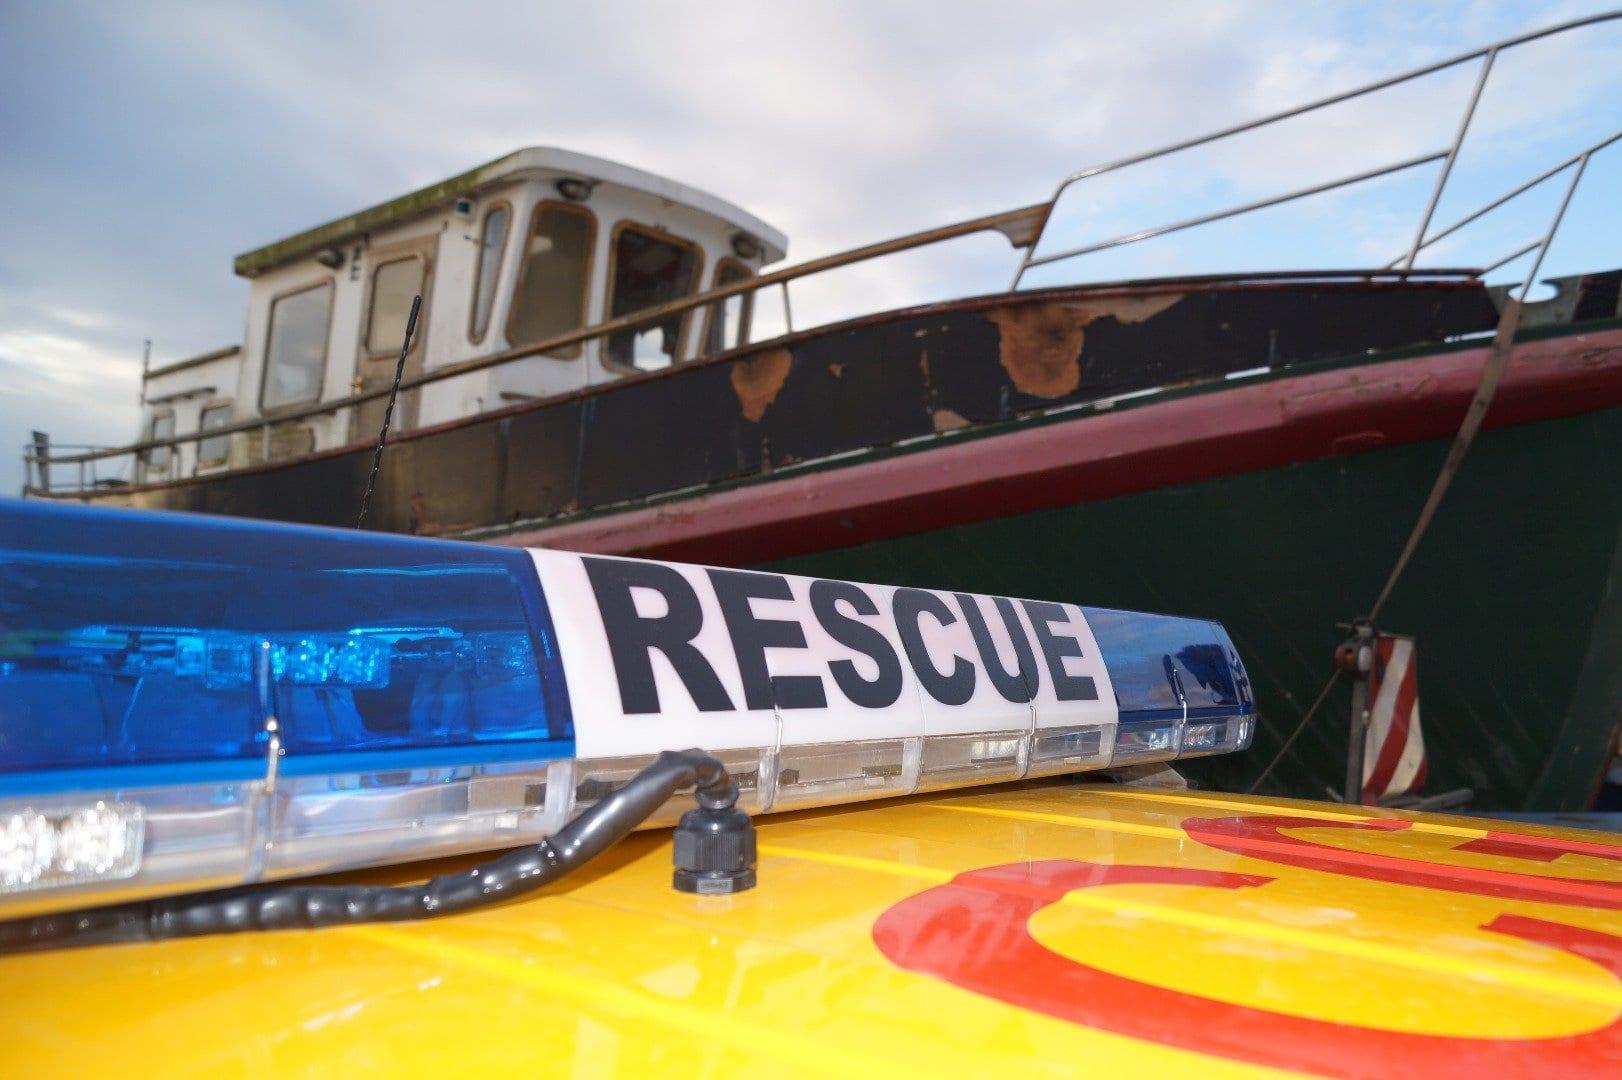 Ann-Letitia-Russell-Rescue-18.8.15